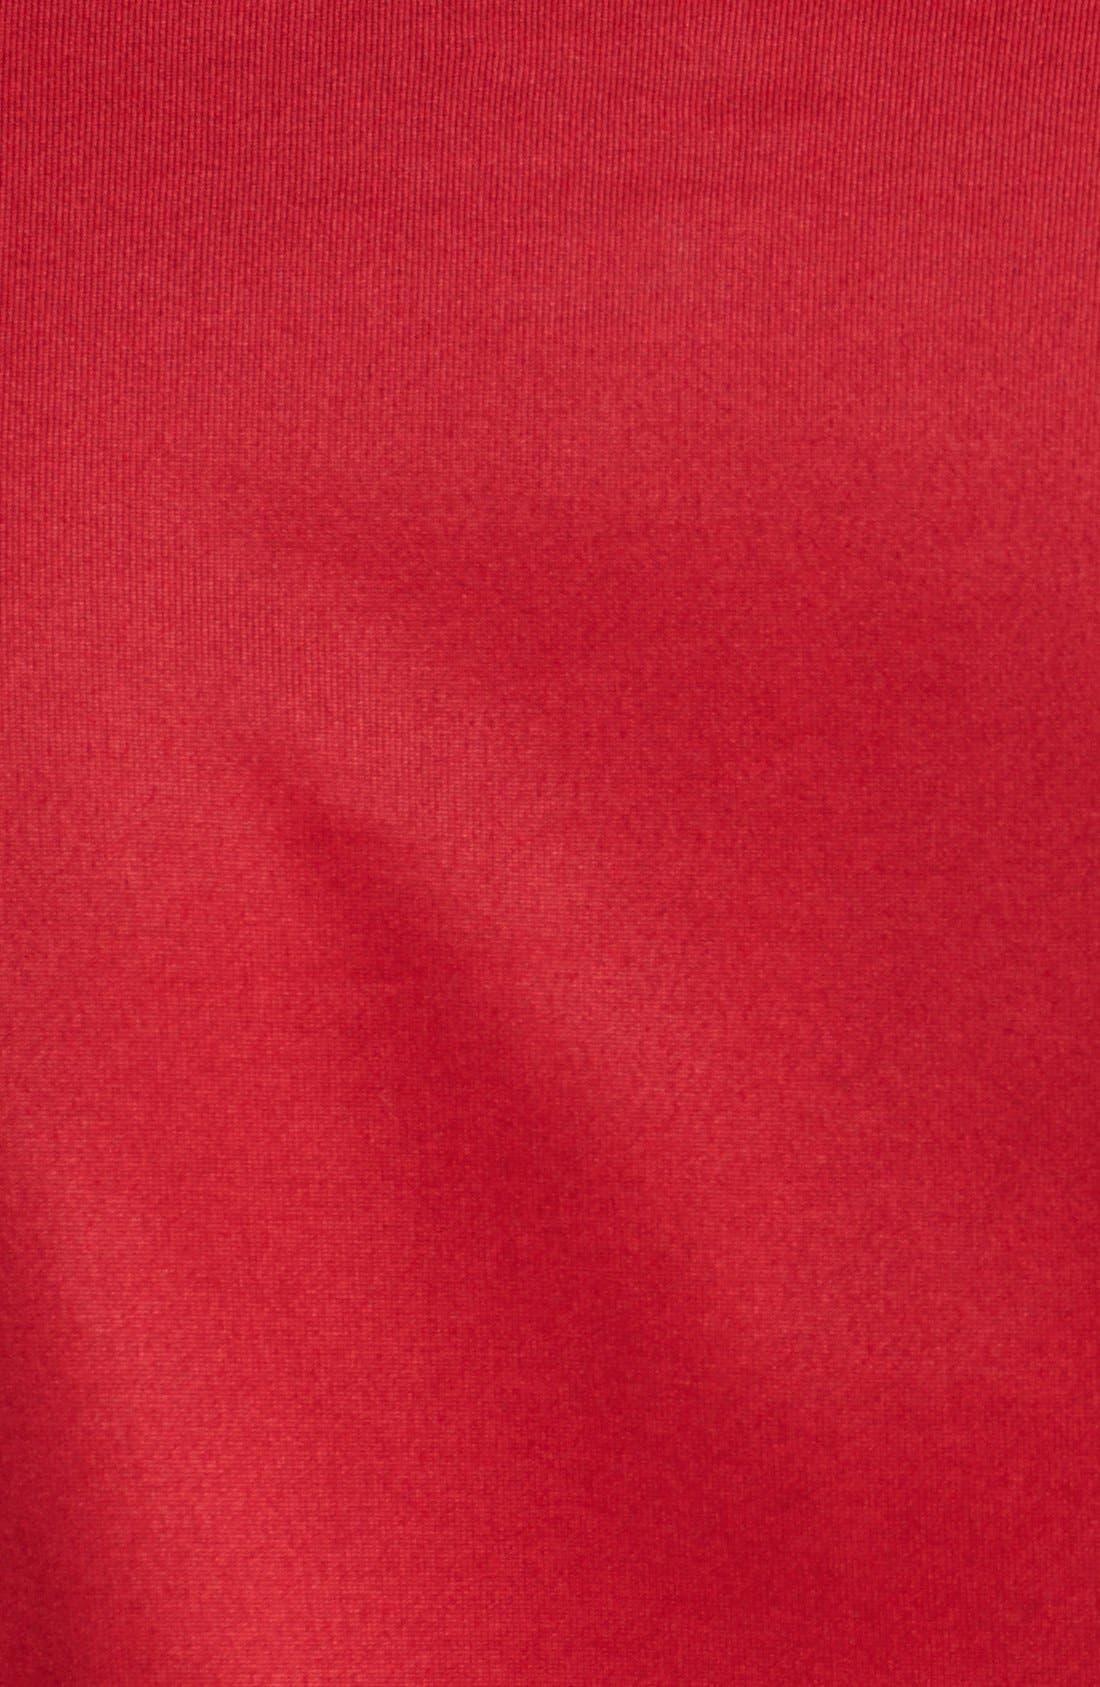 Alternate Image 3  - Nike 'Legend' Dri-FIT V-Neck T-Shirt